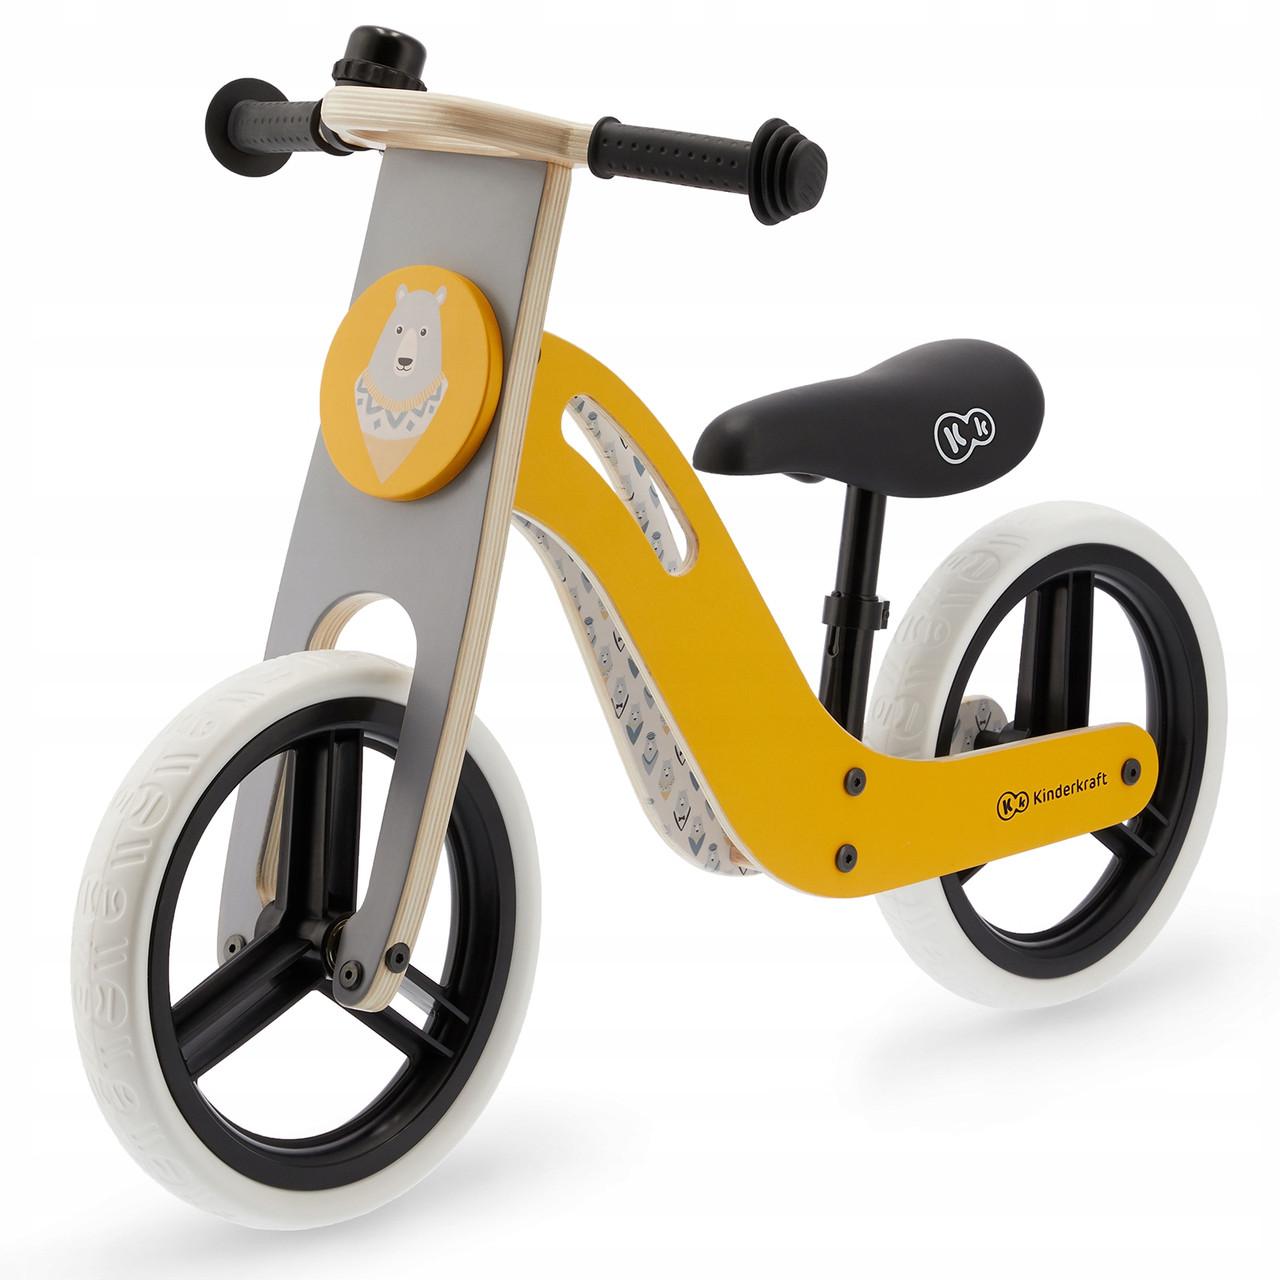 Велобег детский деревянный Kinderkraft Uniq жёлтый (беговел, самокат-беговел, детский транспорт)